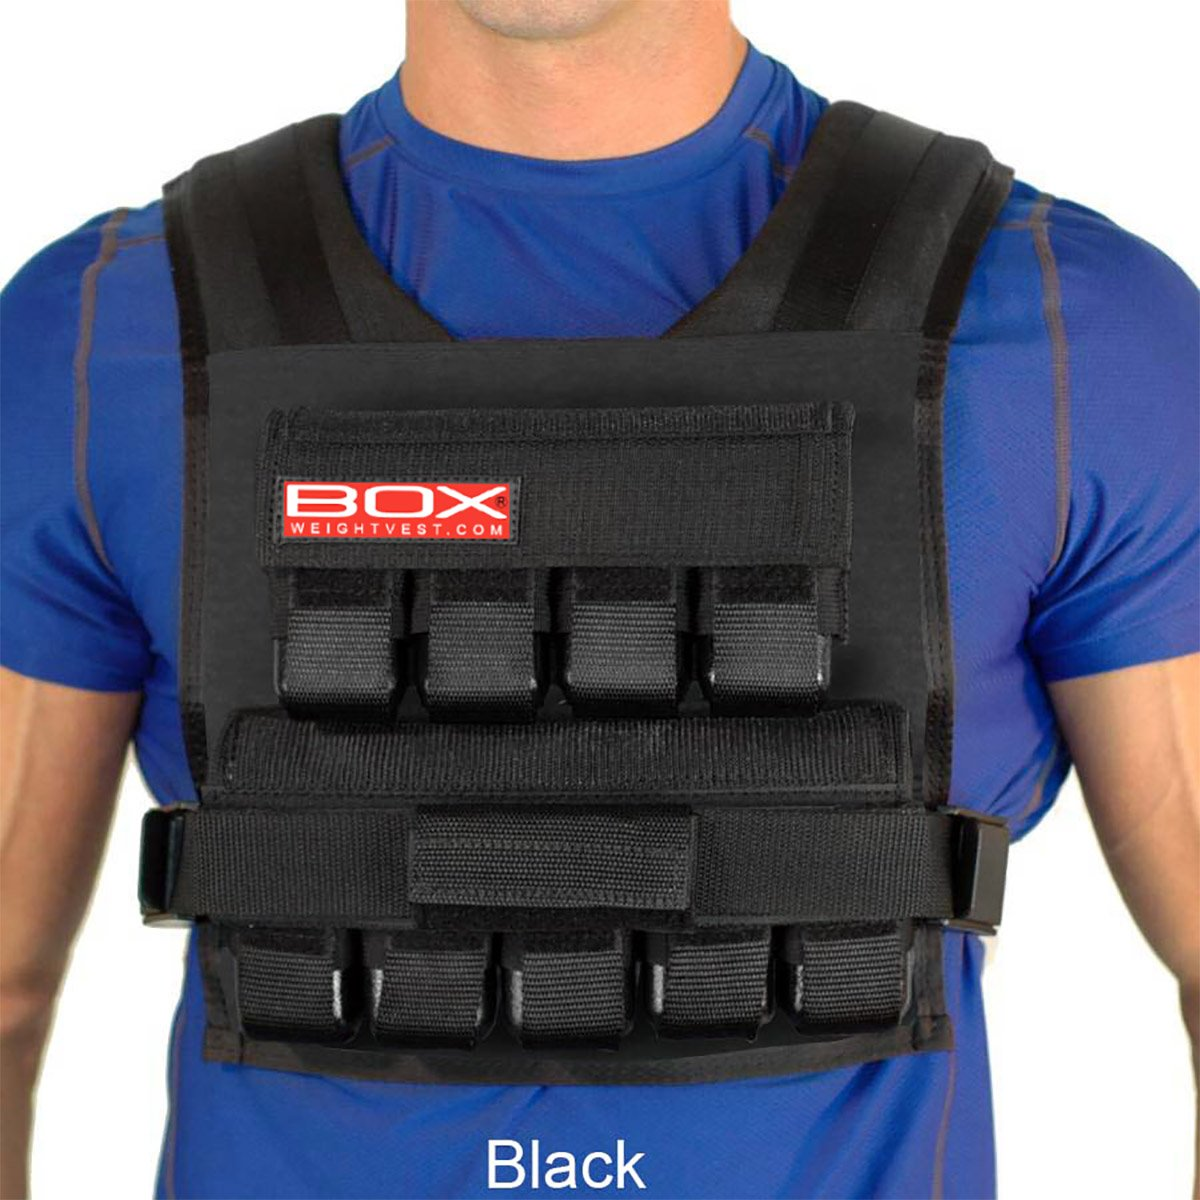 Box 45 Lb Weightvest (Black)